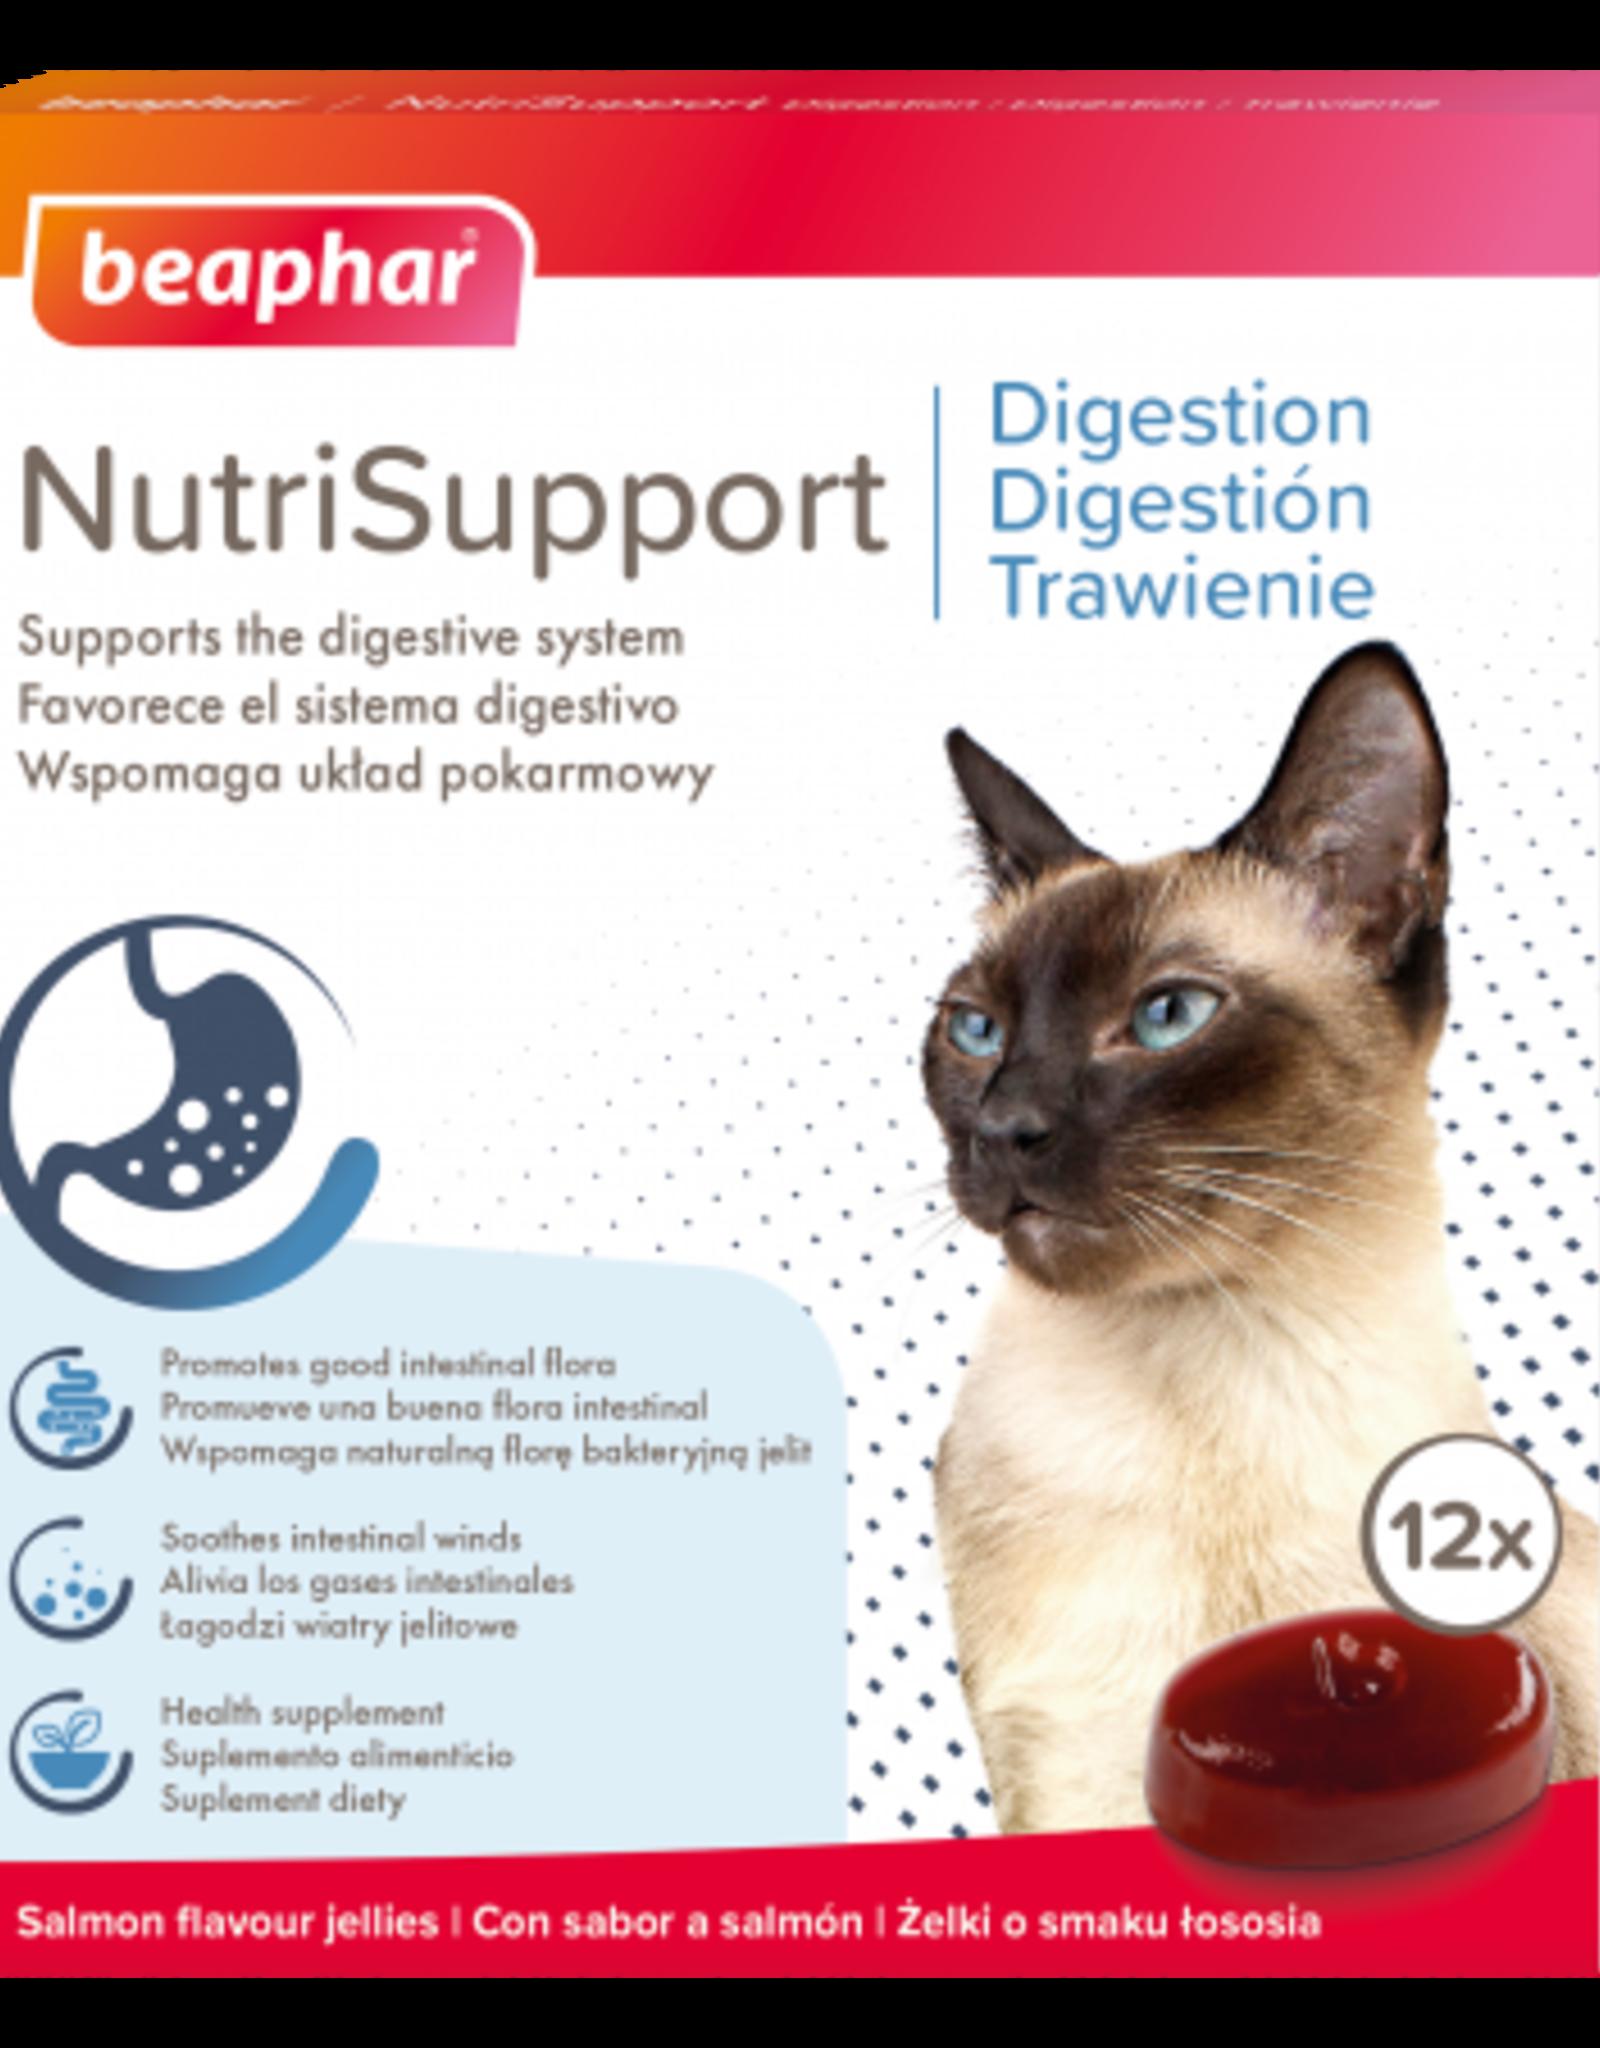 Beaphar NutriSupport Digestion Cat Supplement, 12 pack